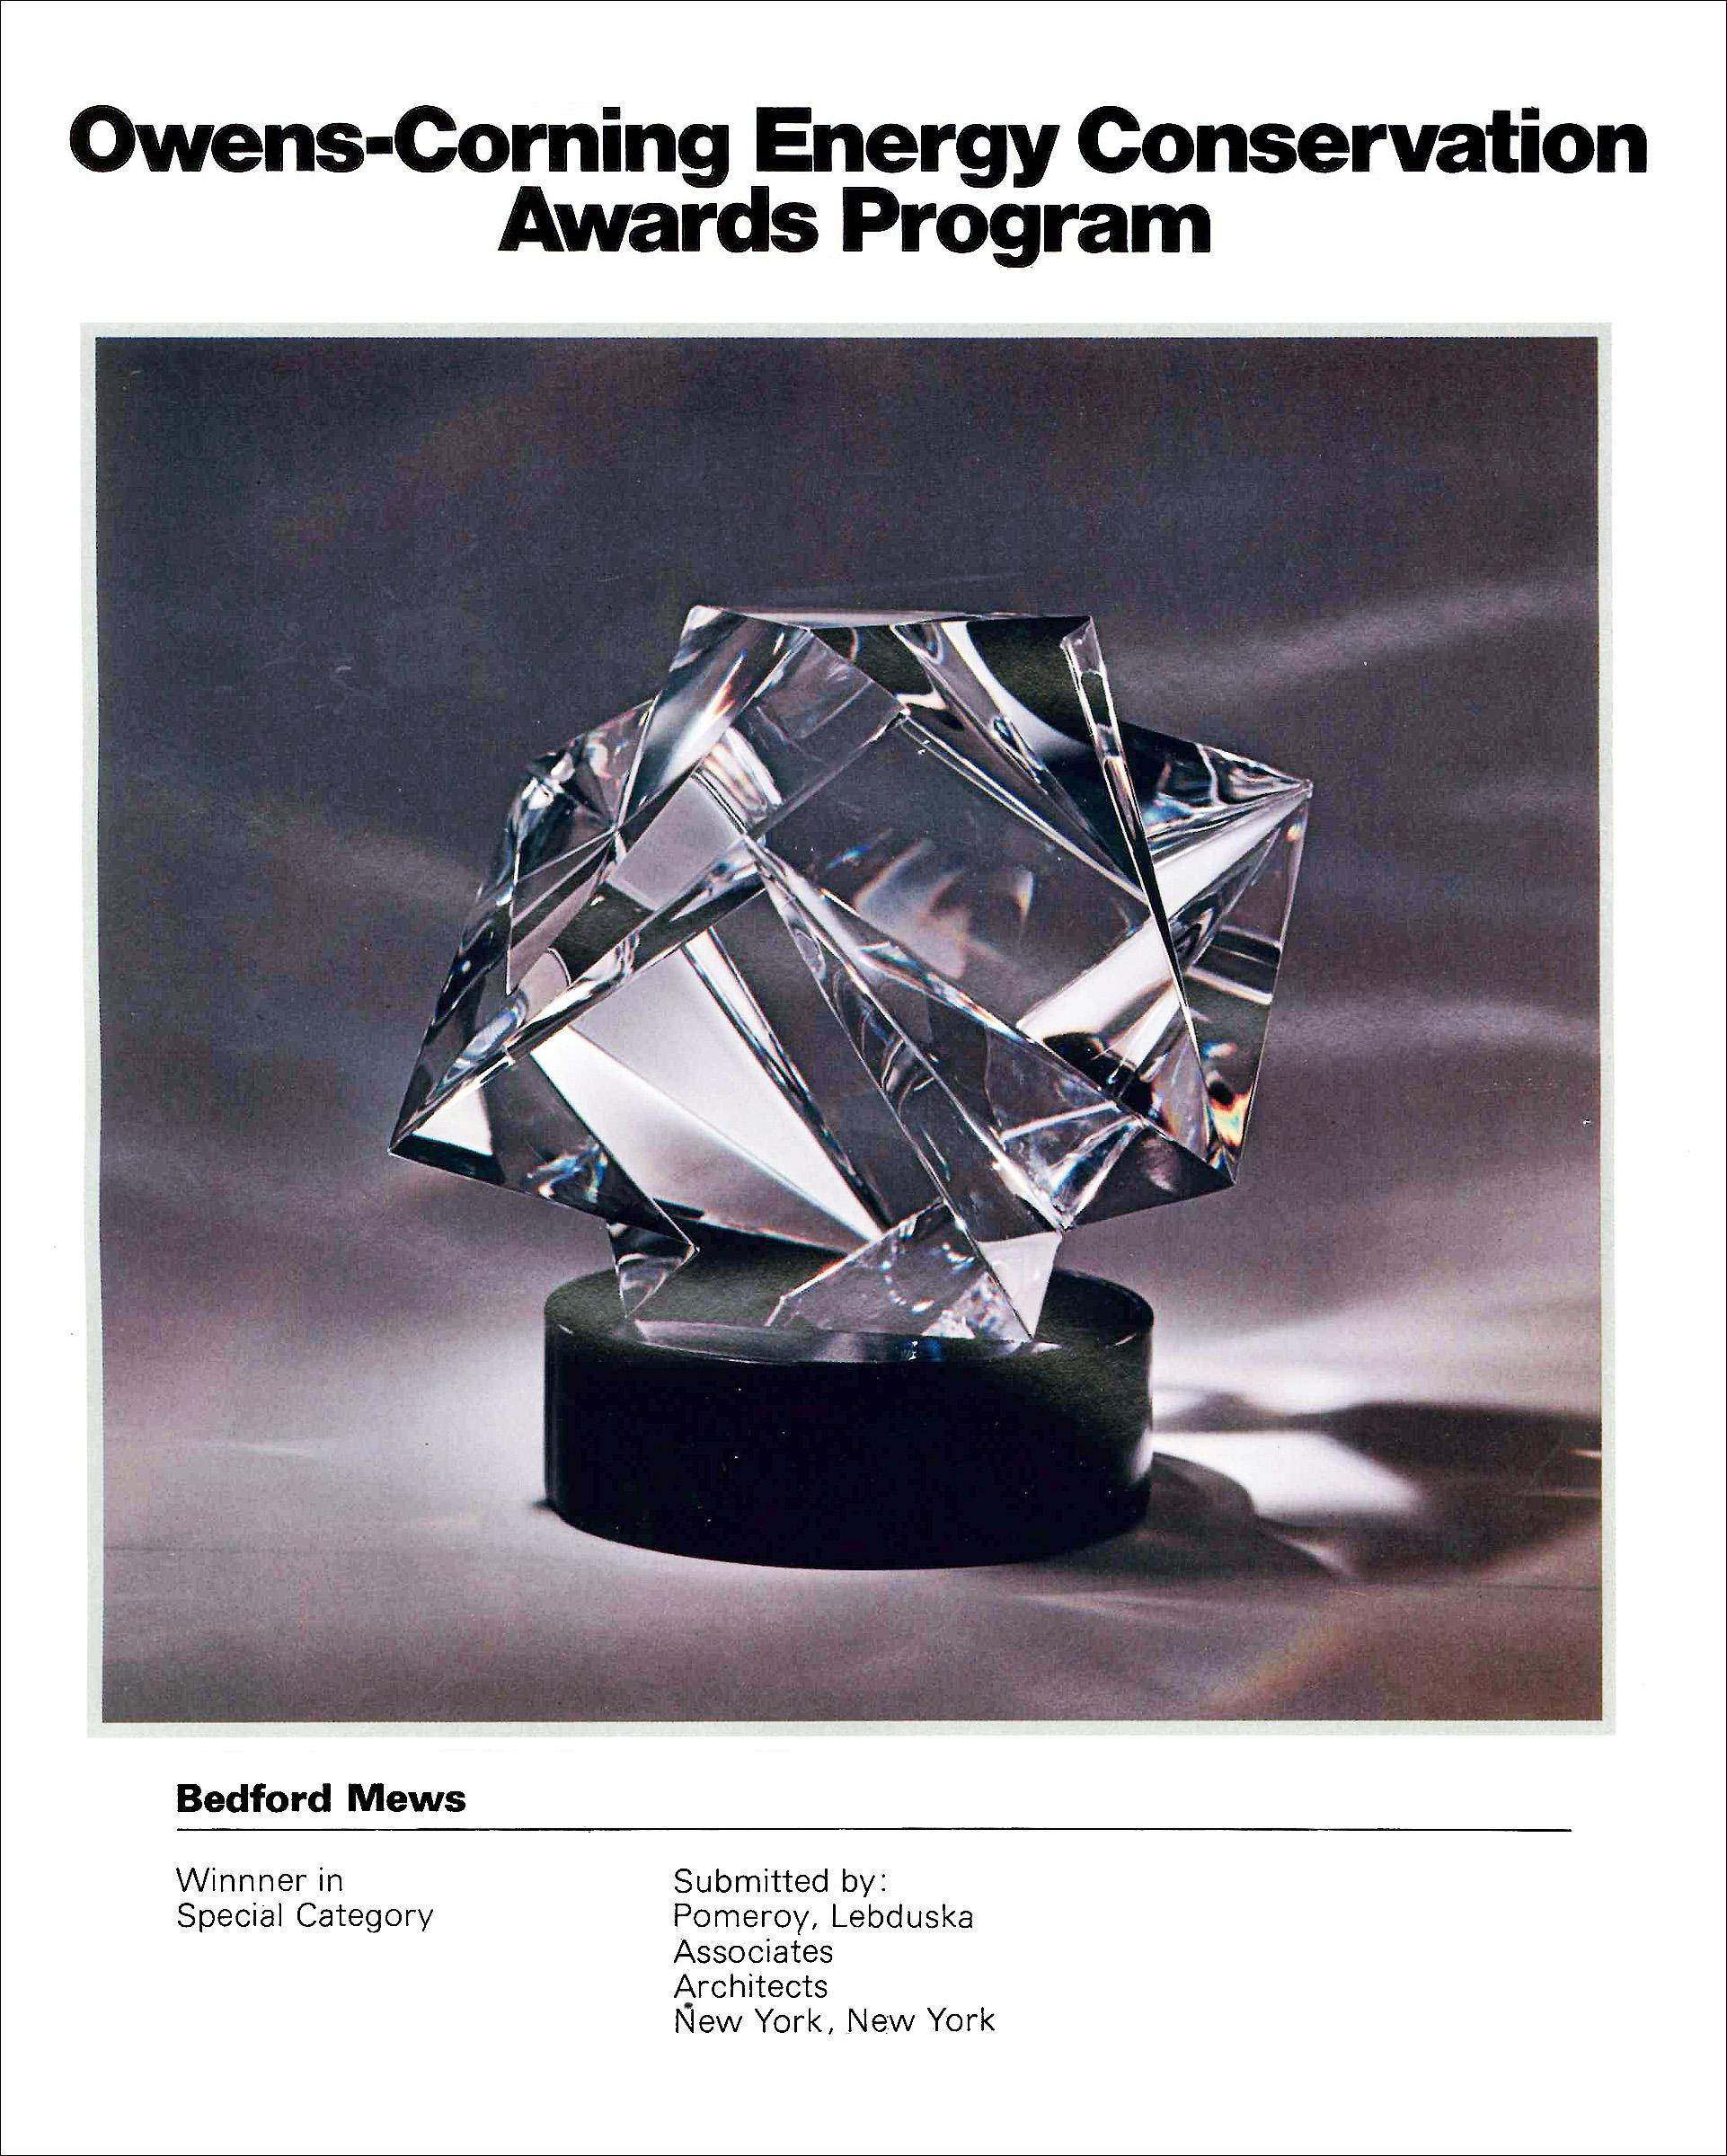 Owens Corninbg Energy Conserv Awards Bed Mews